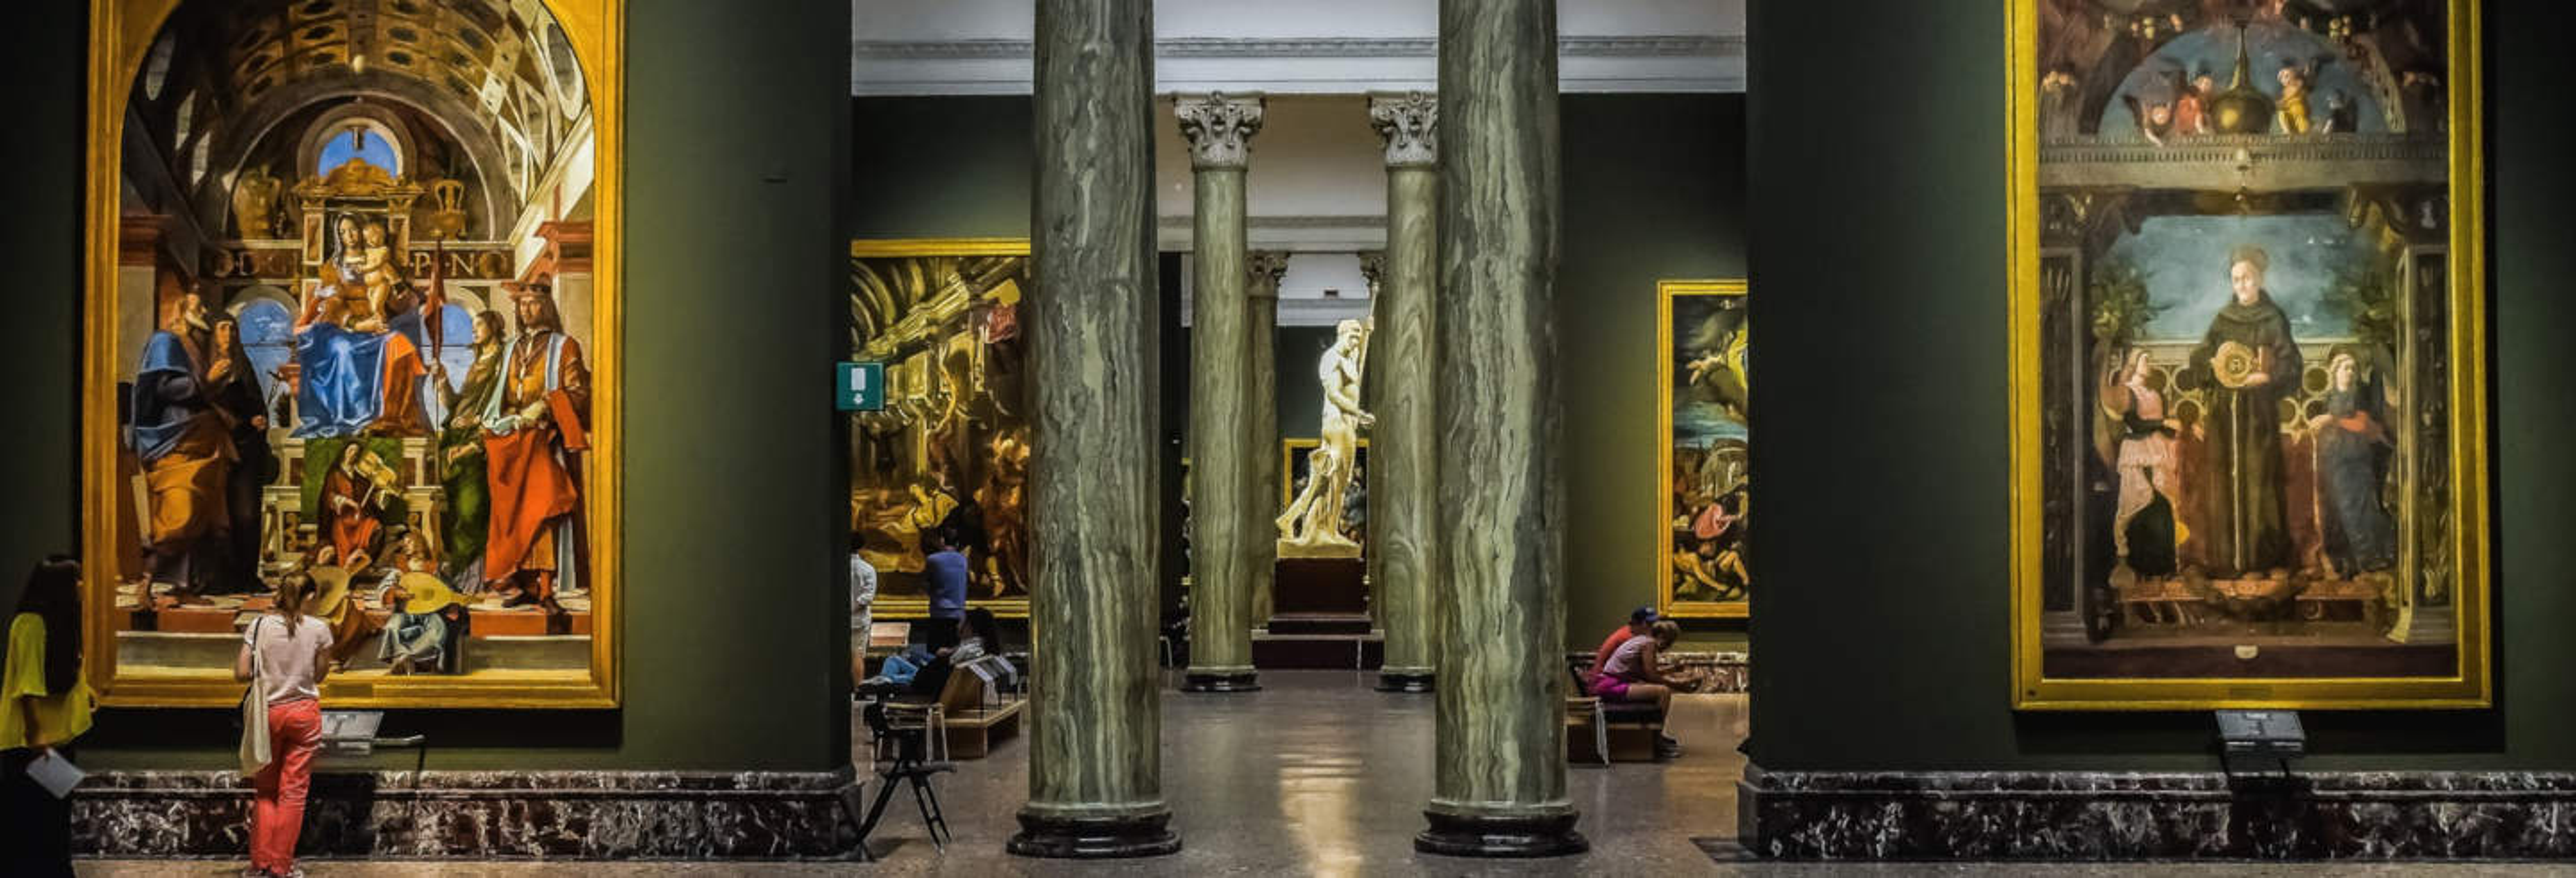 Brera Guided Tour & Pinacoteca di Brera Ticket